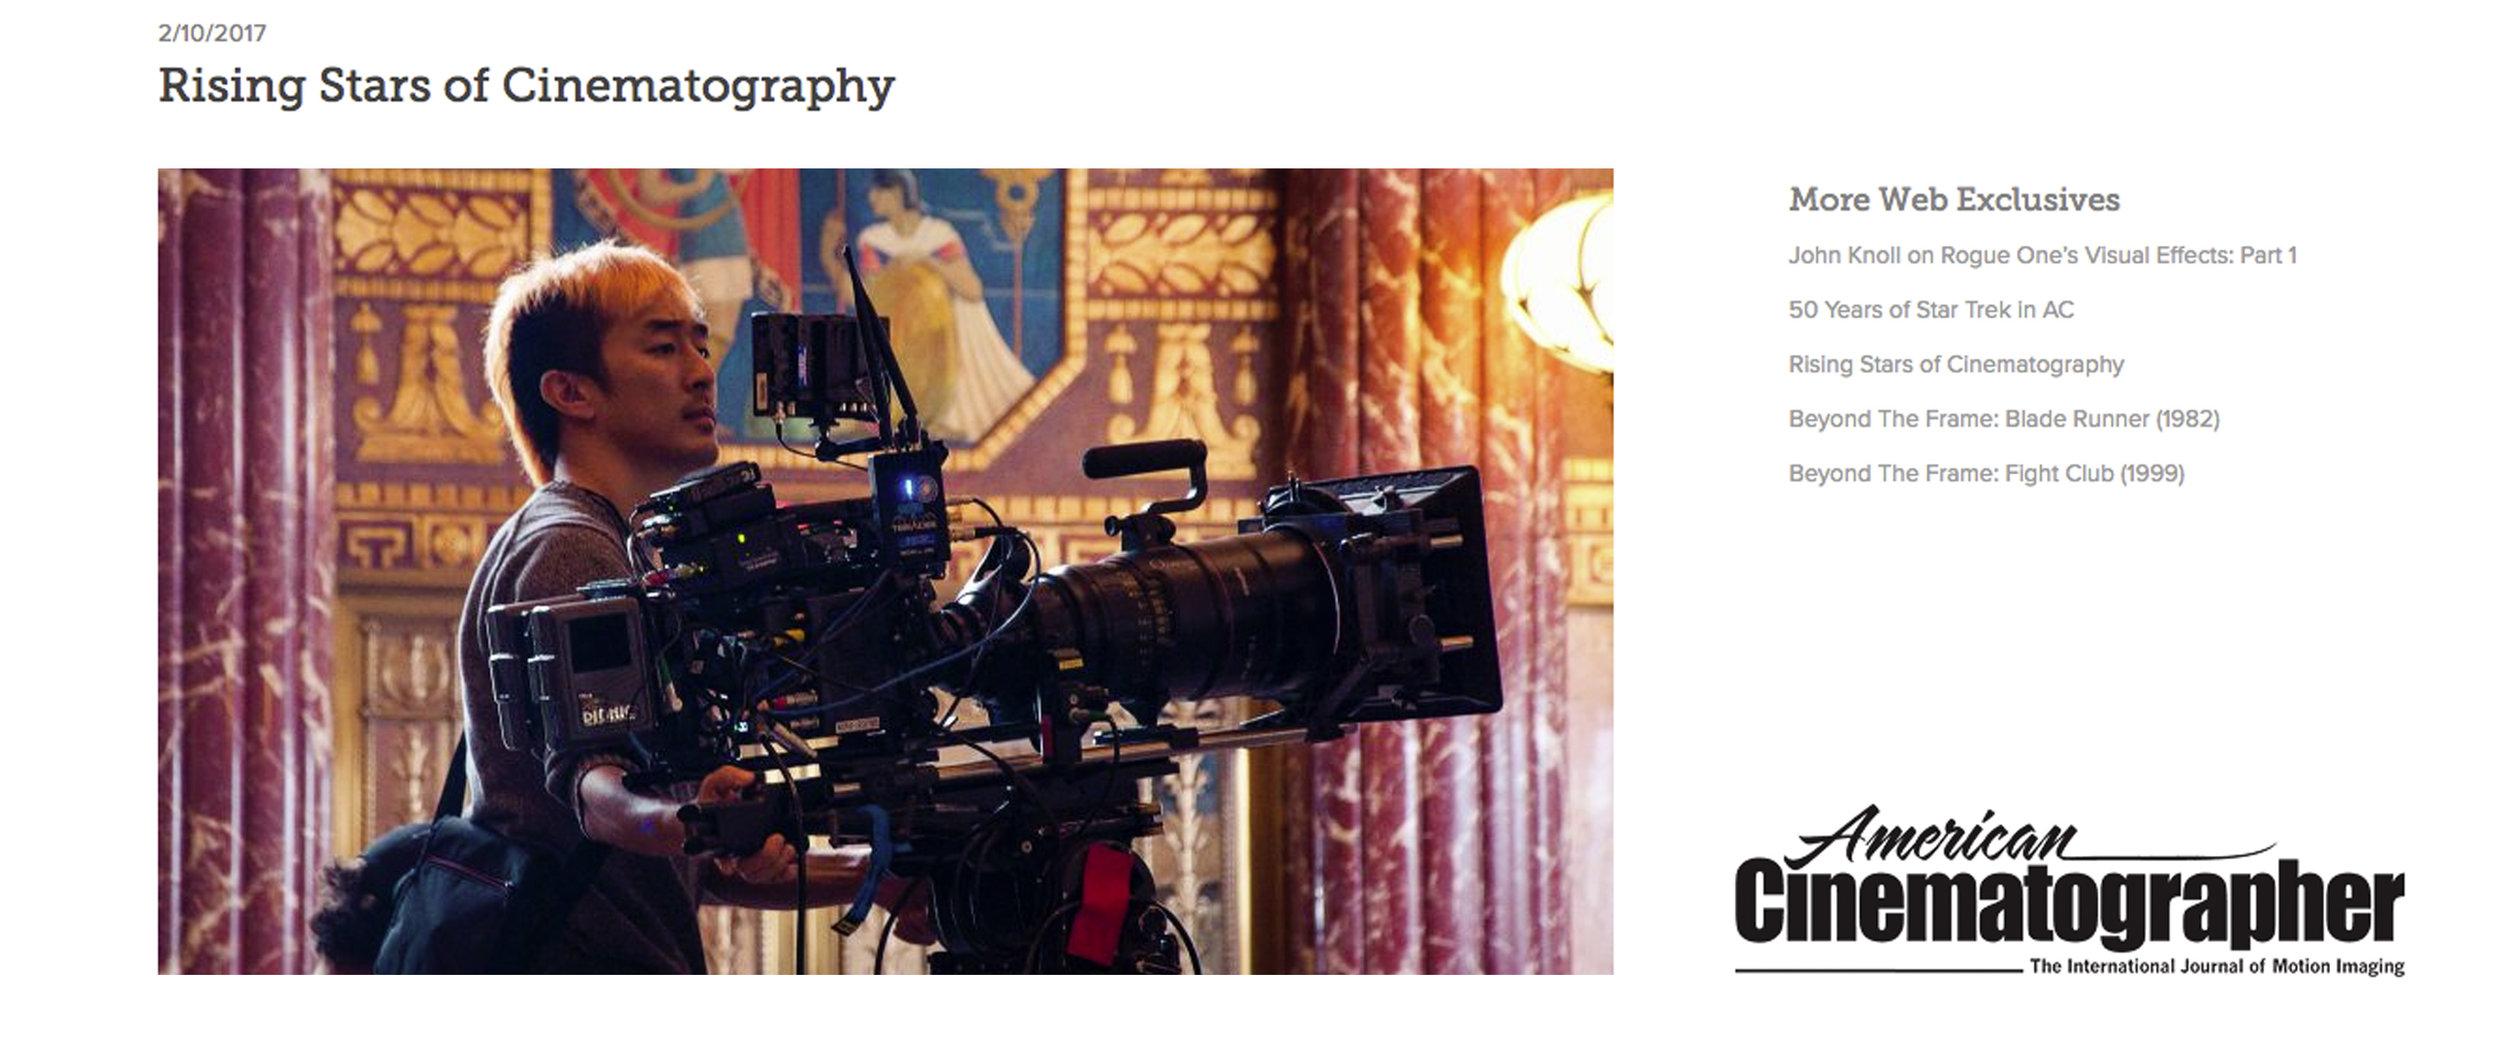 American Cinematographer Article.jpg